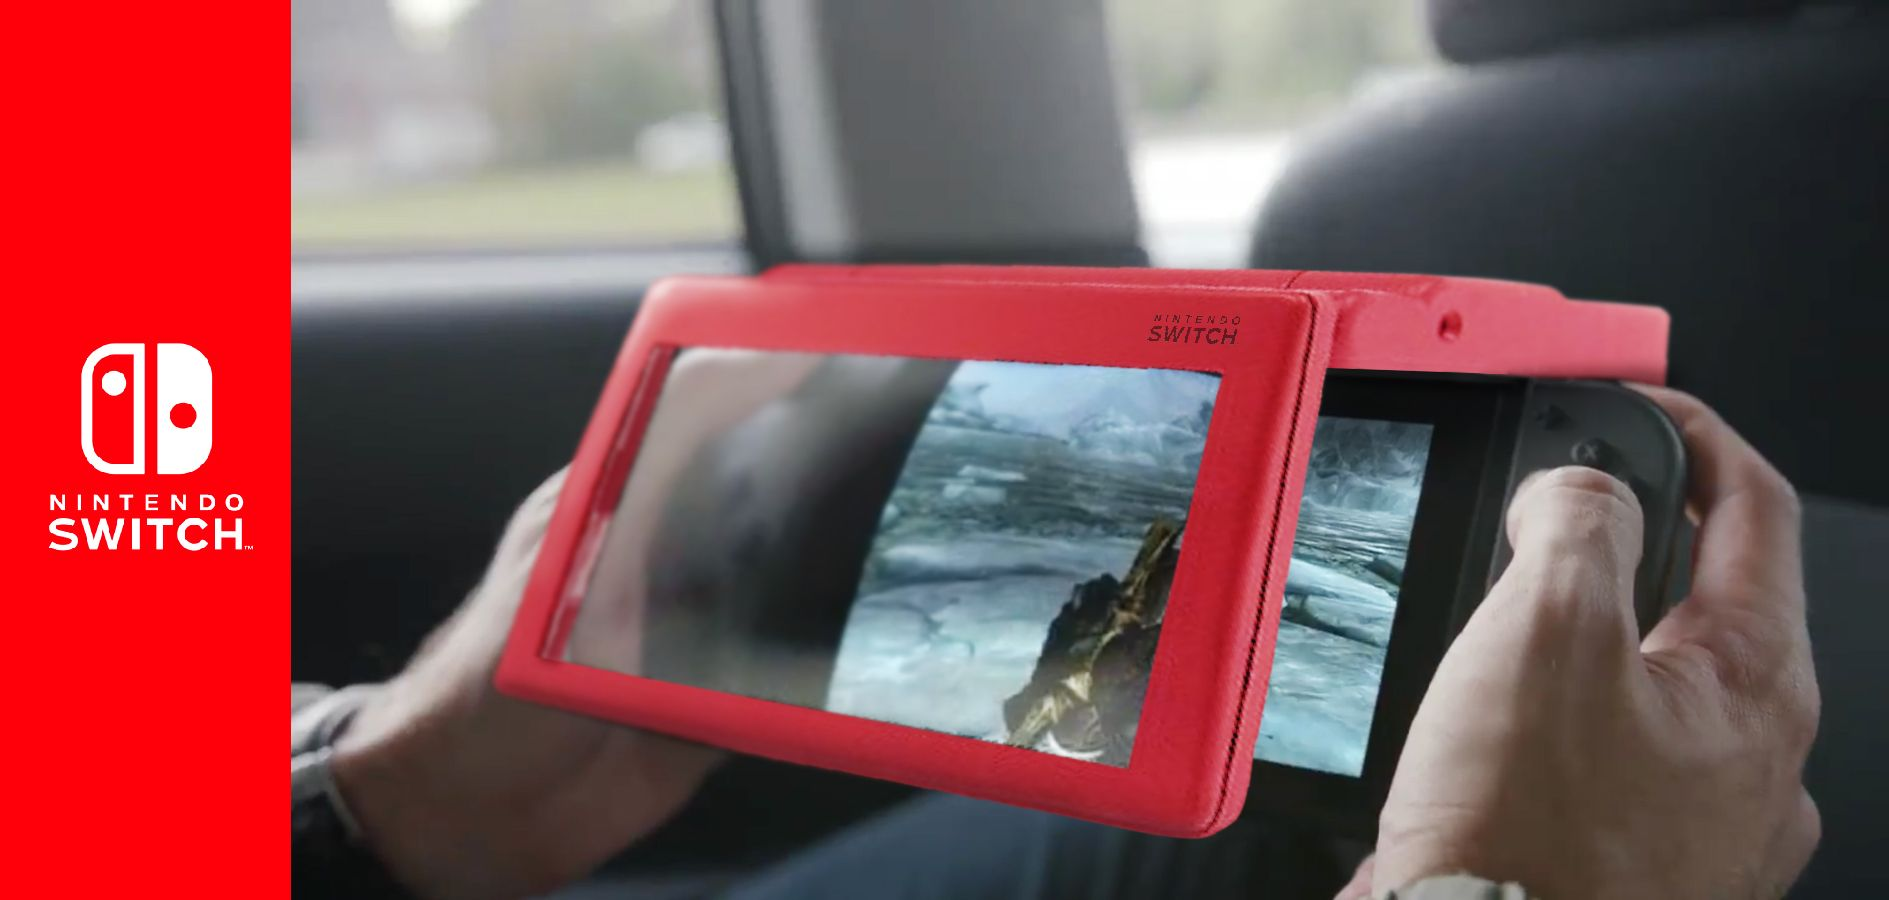 Nintendo already announces switch xl handheld ifteahbr